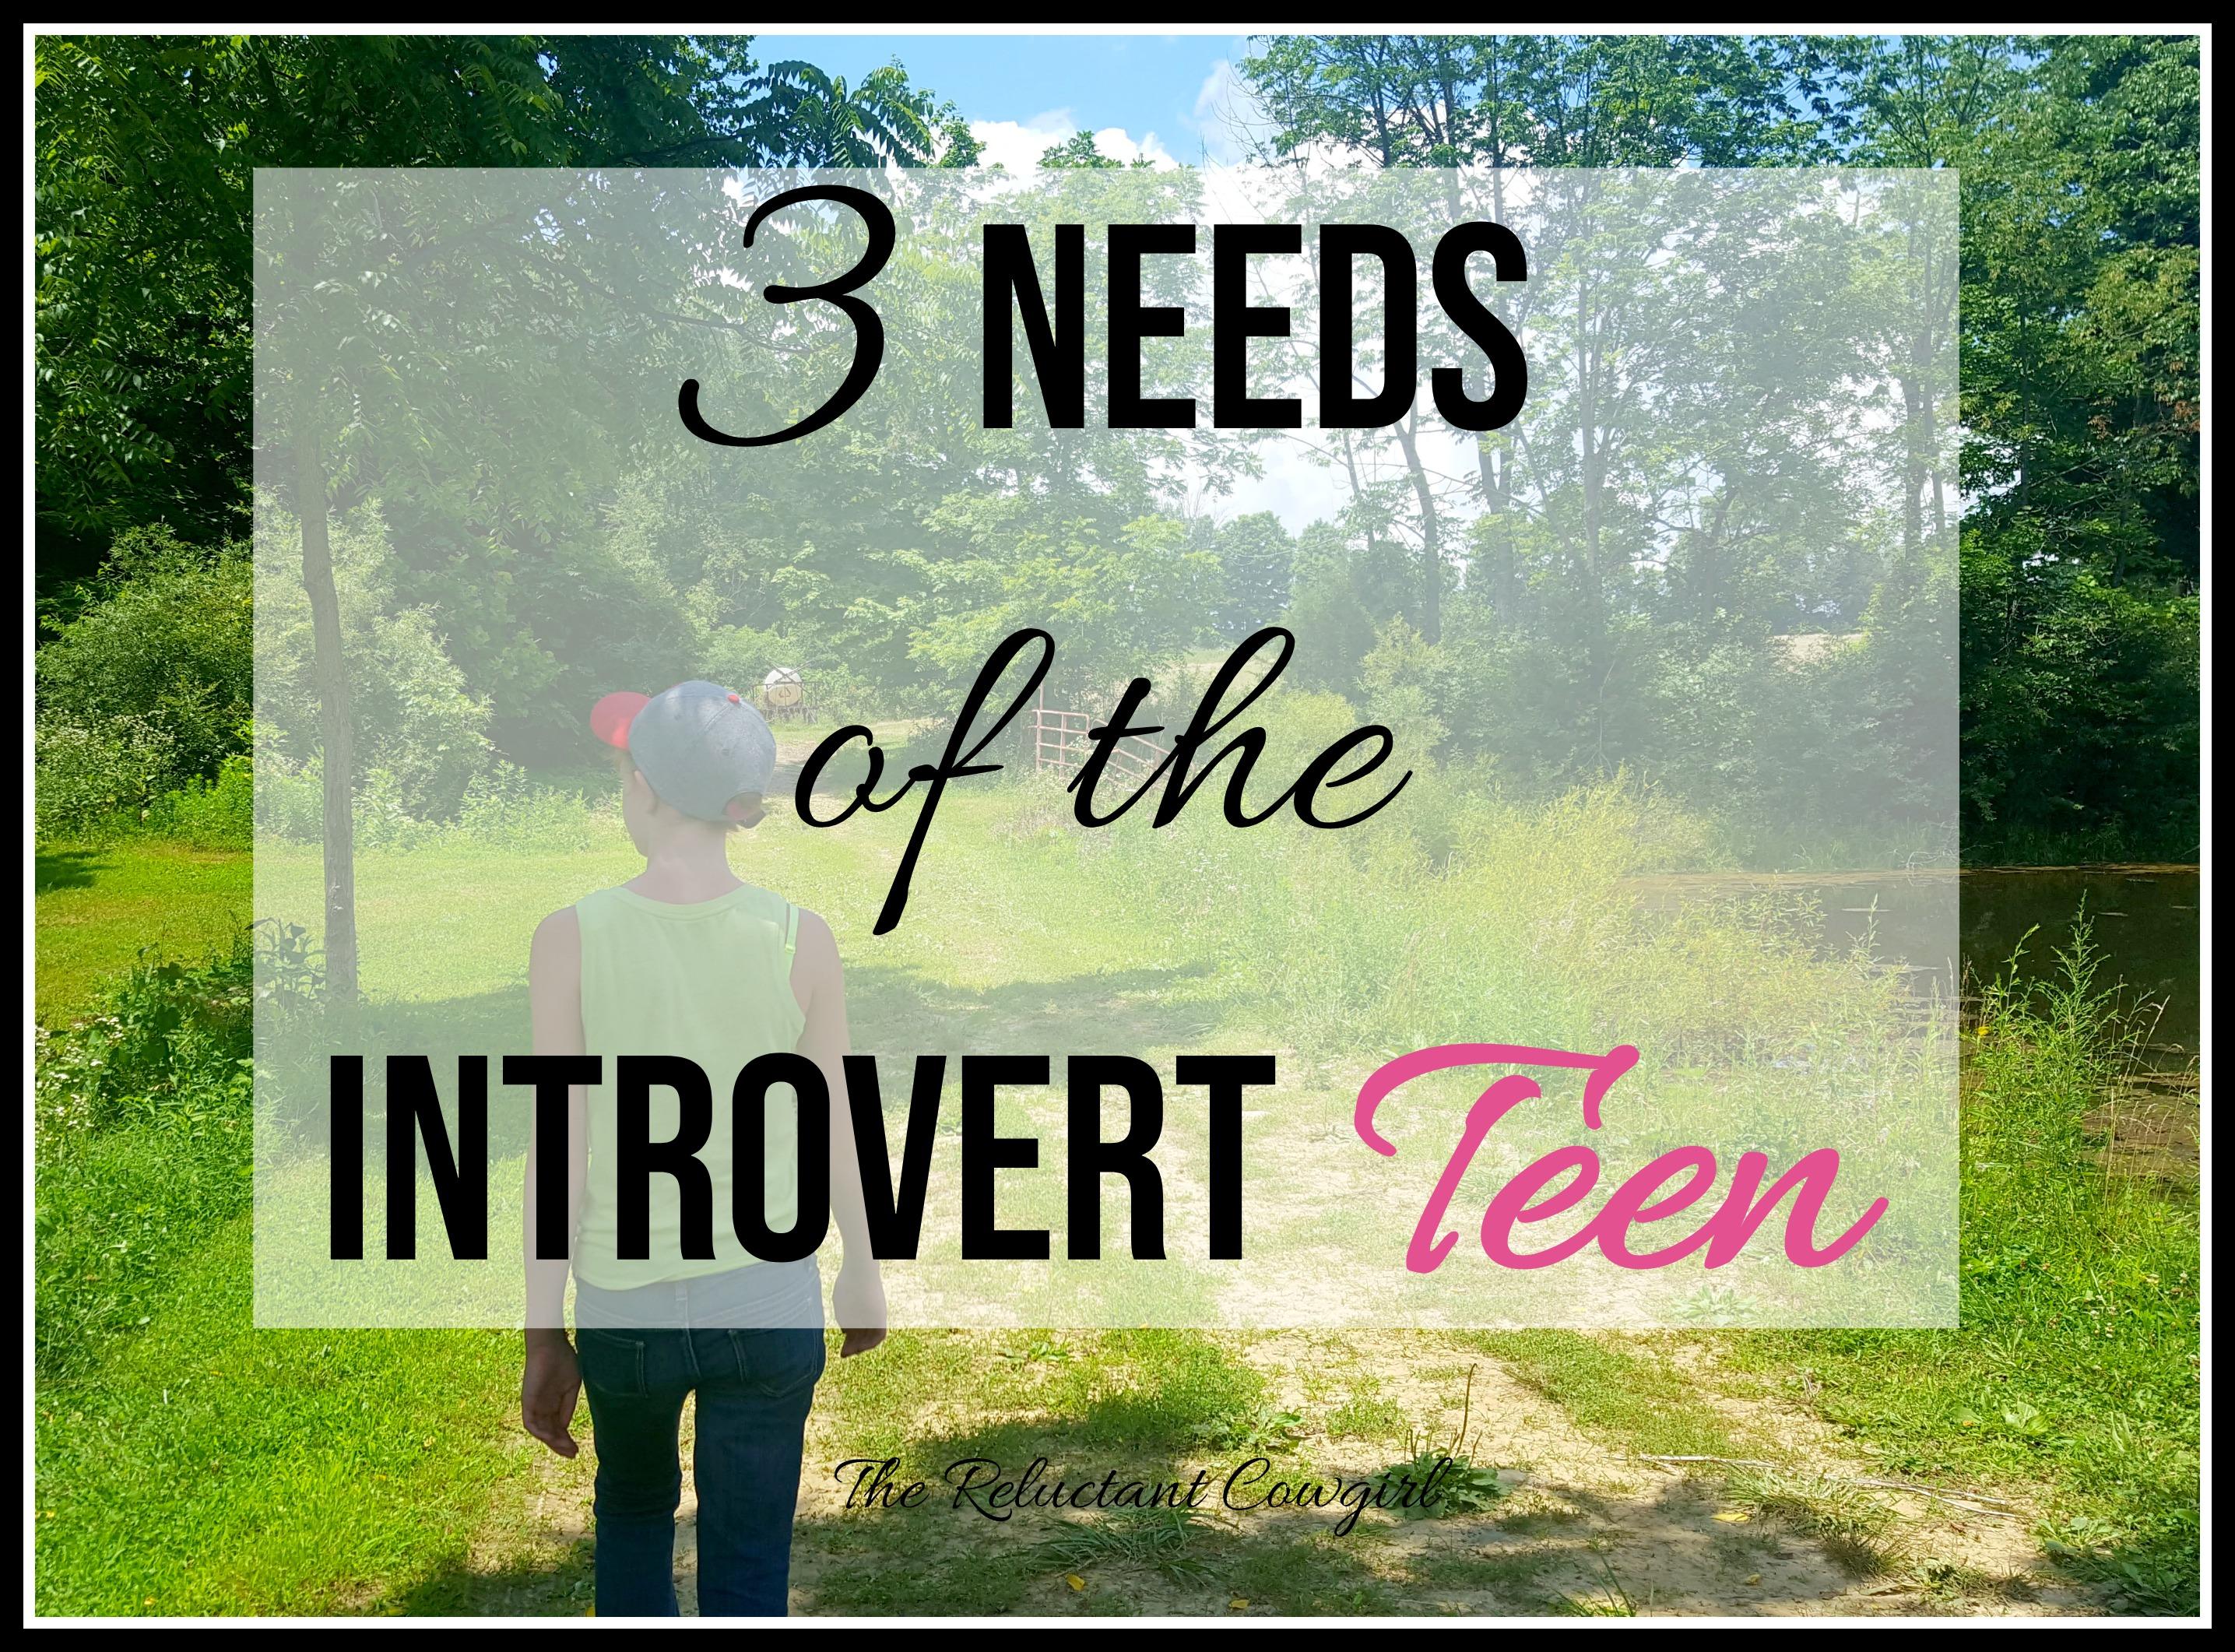 3 Needs of the Introvert Teen